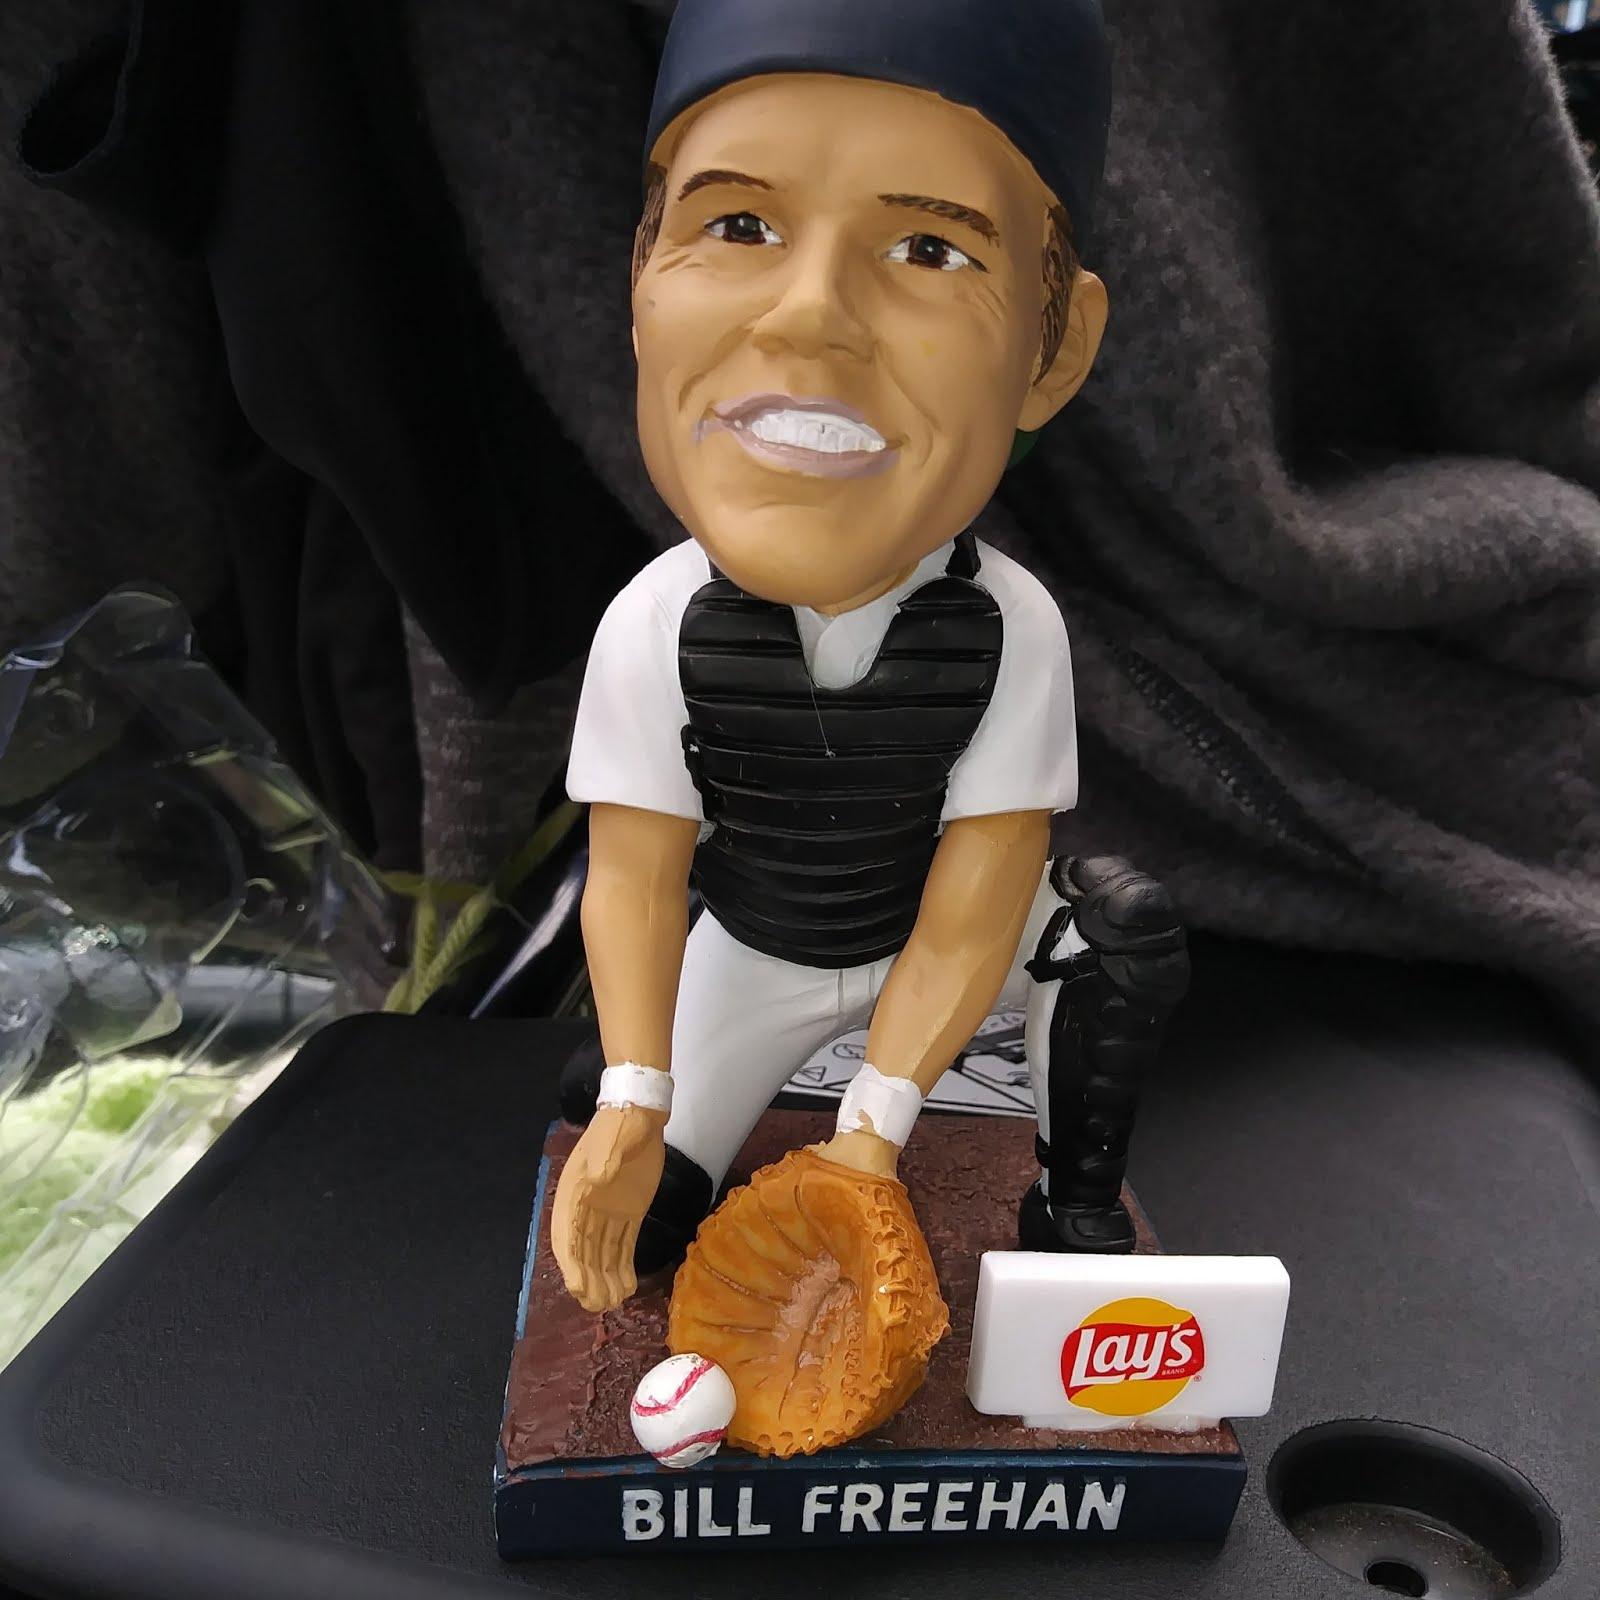 Bill Freehan Bobblehead